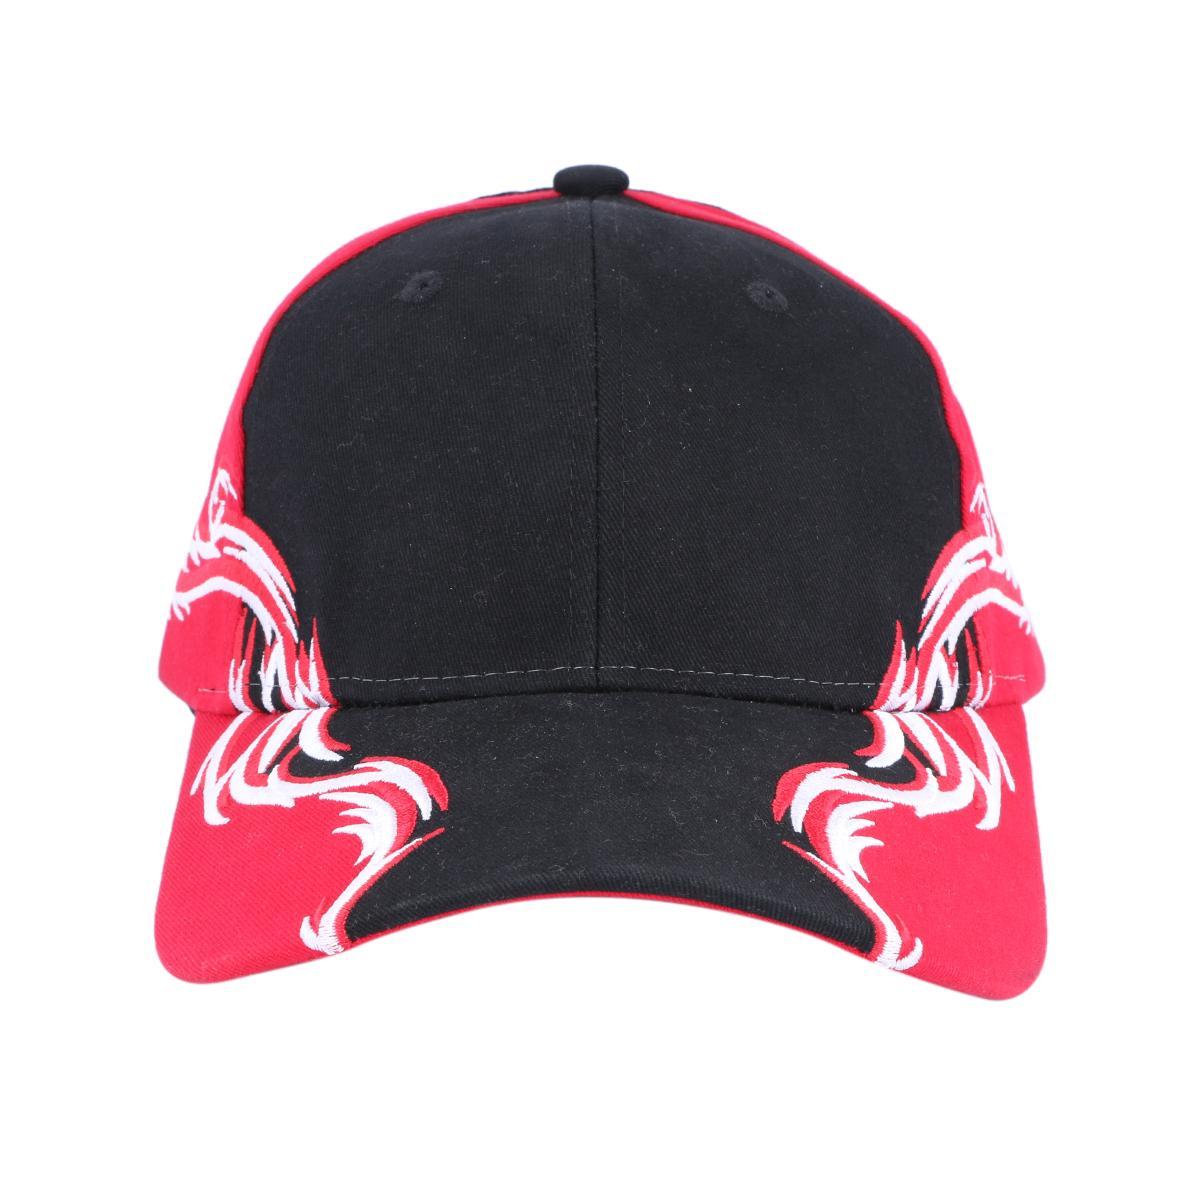 5354232b16ea0 Men s Hats In Bangladesh At Best Price - Daraz.com.bd